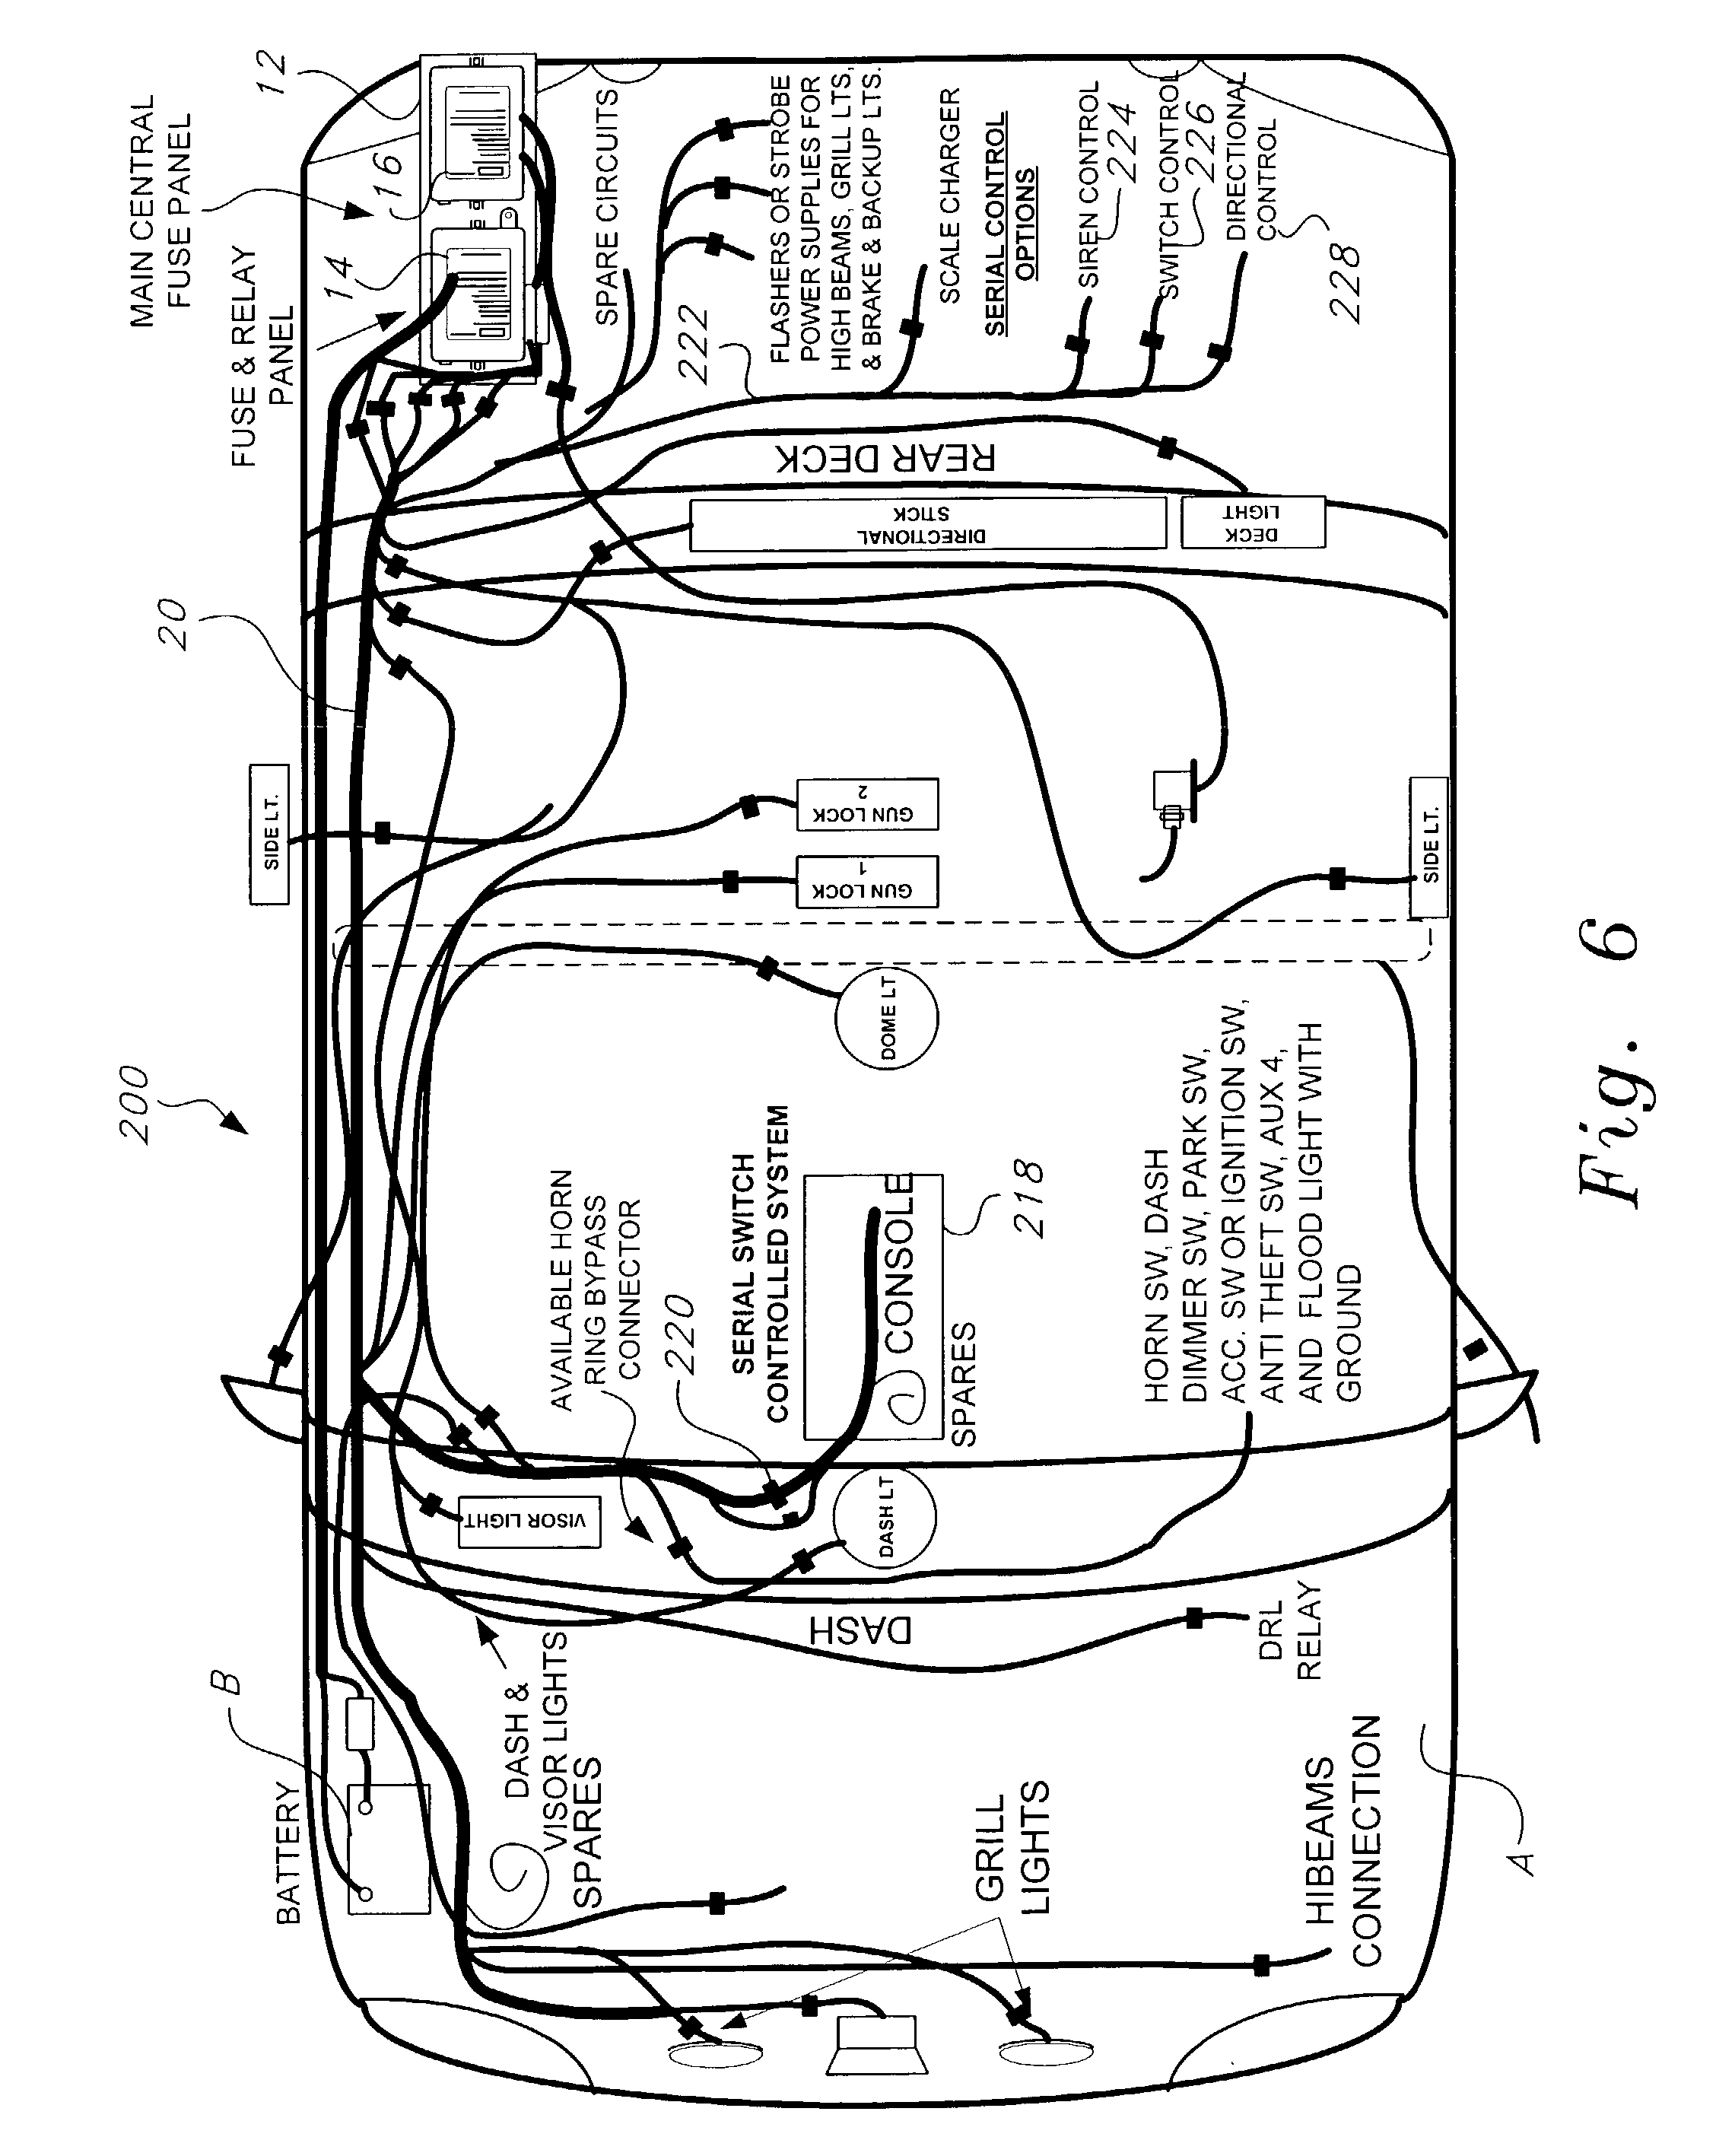 18 circuit universal wiring harness